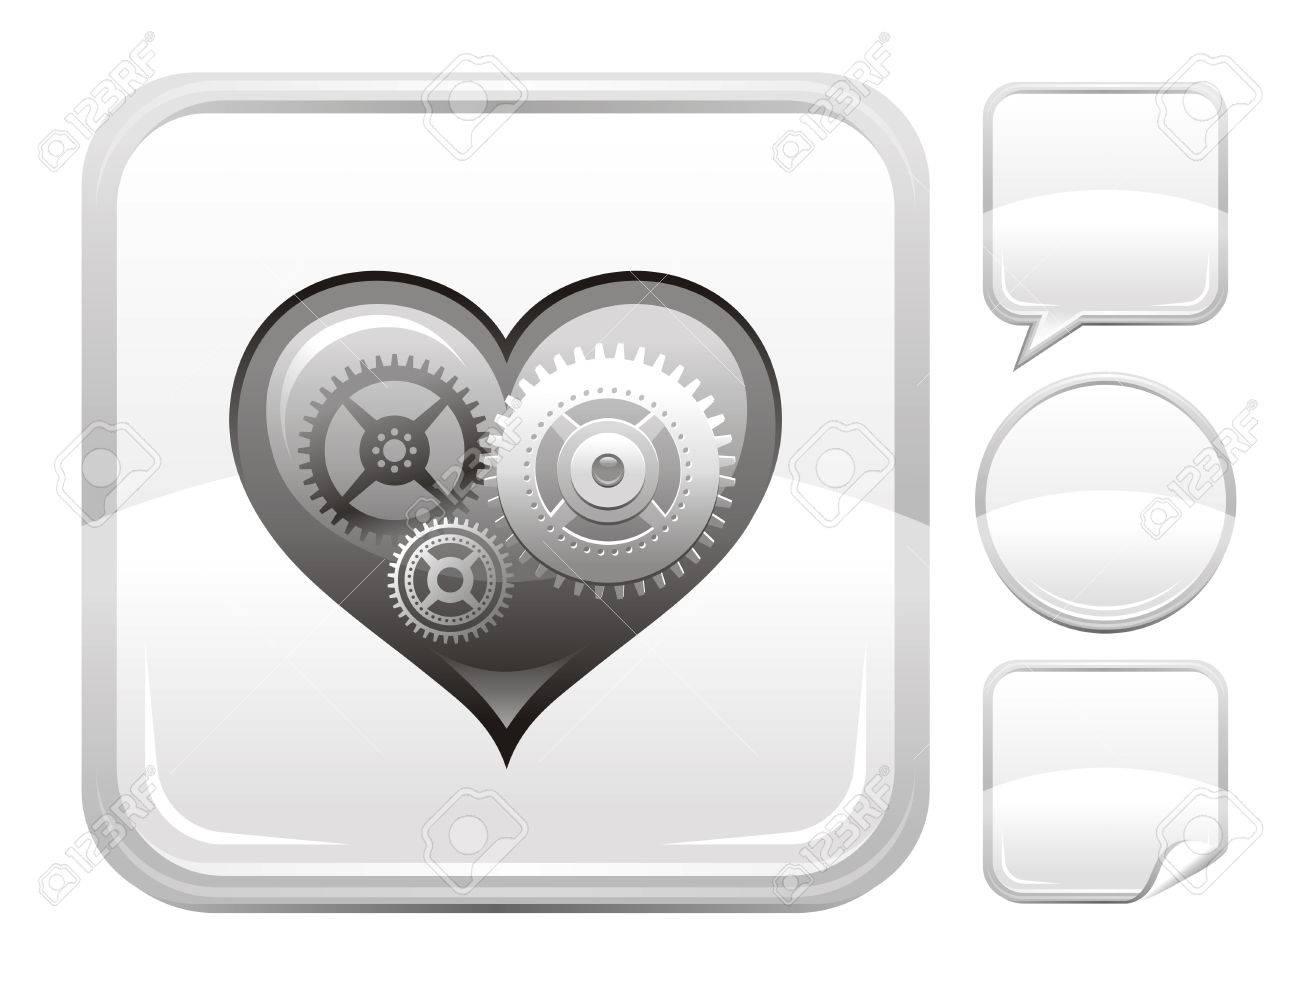 rencontres boutons en métalAlgoa FM rencontres en ligne